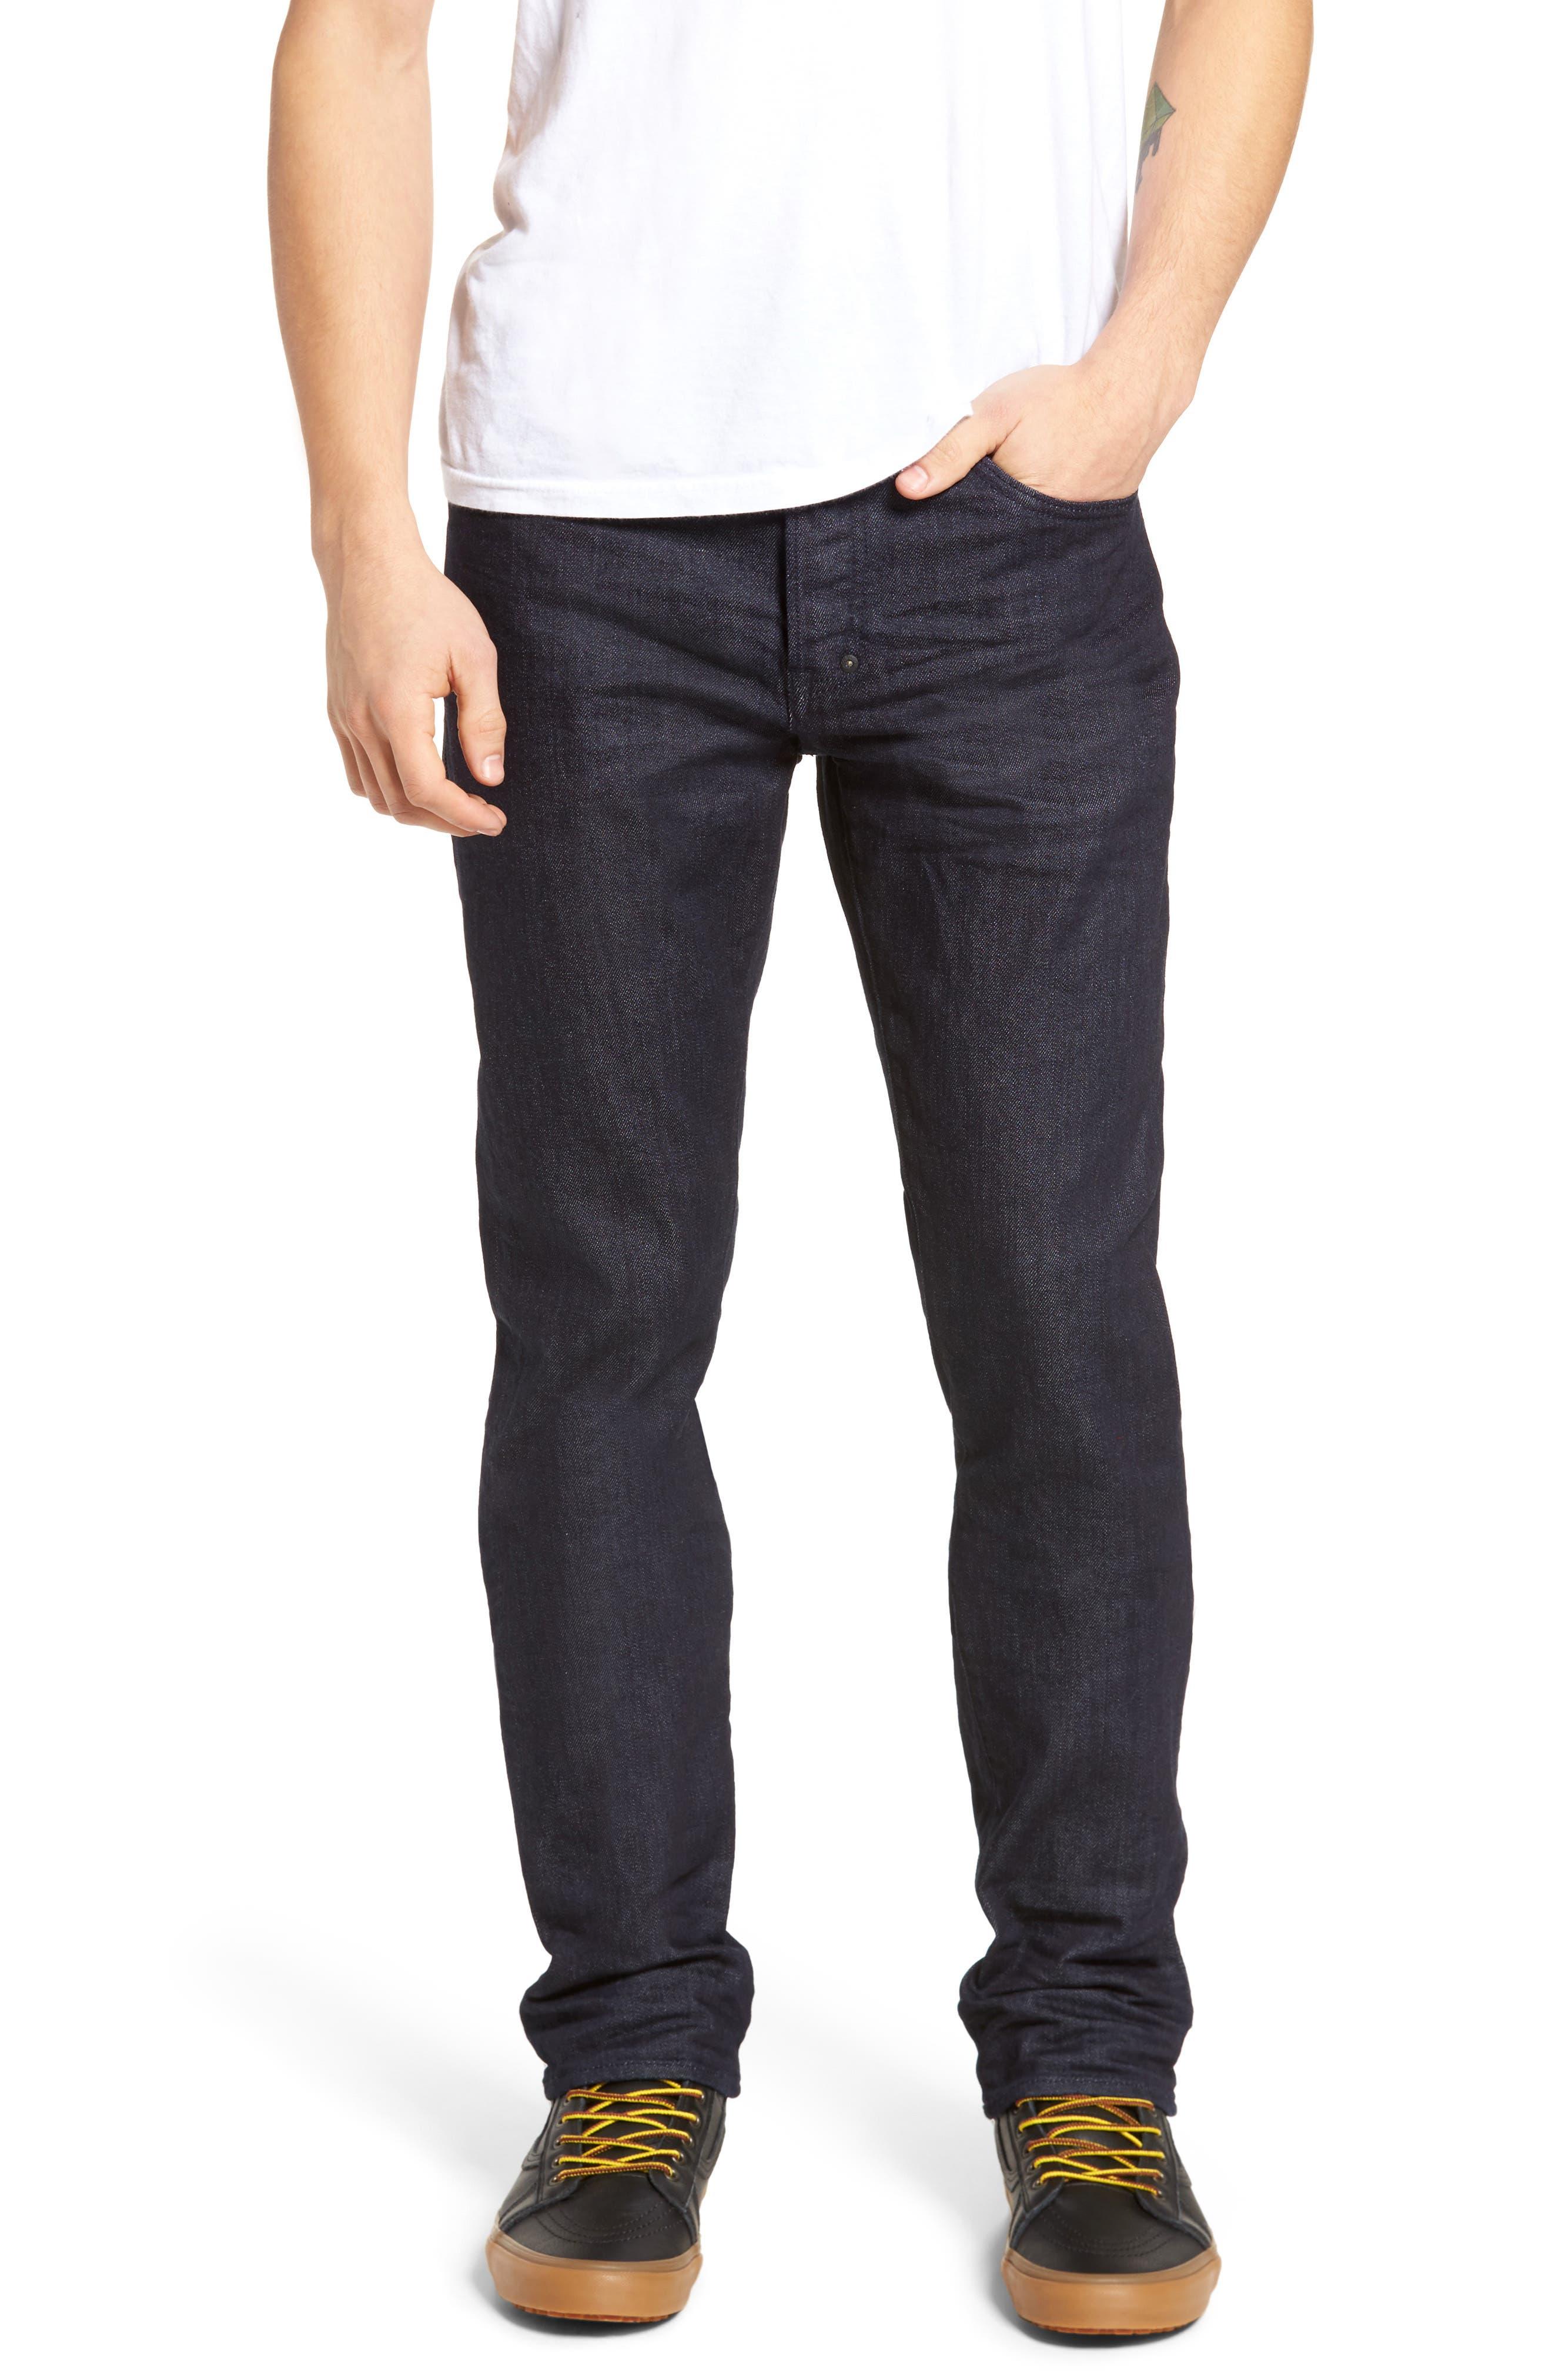 Demon Slim Straight Leg Jeans,                             Main thumbnail 1, color,                             416